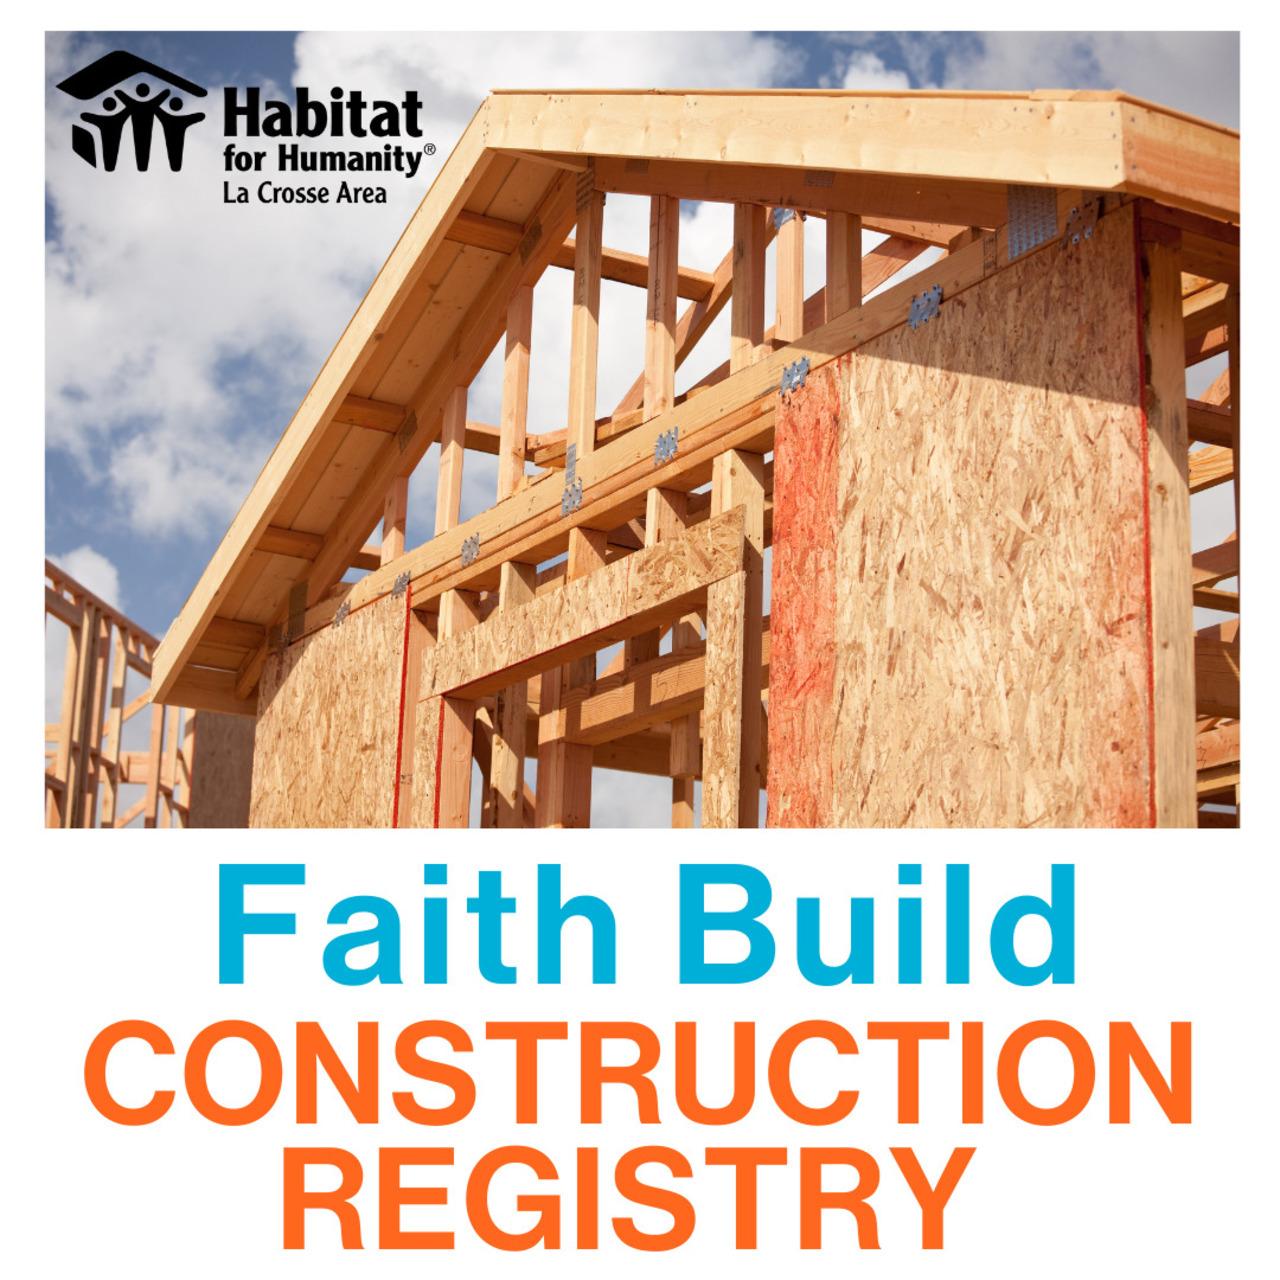 Faith Build Construction Registry